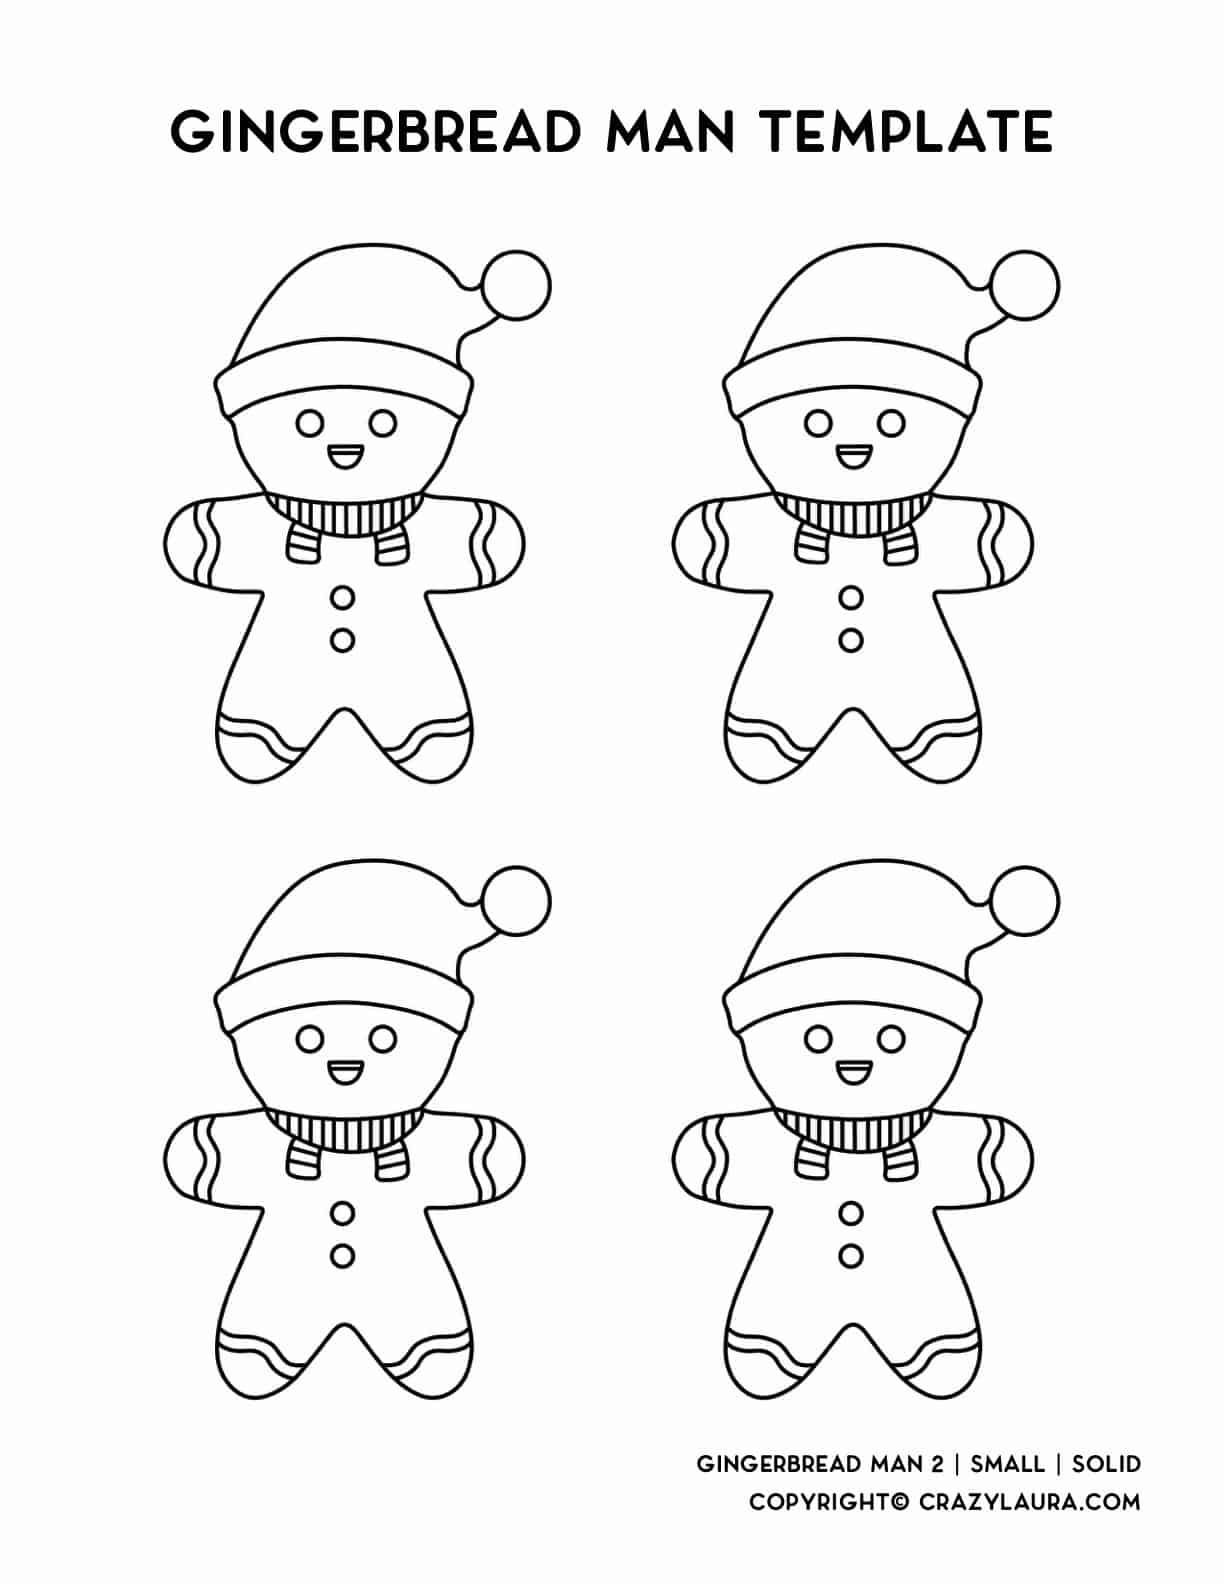 small gingerbread men printable template sheet